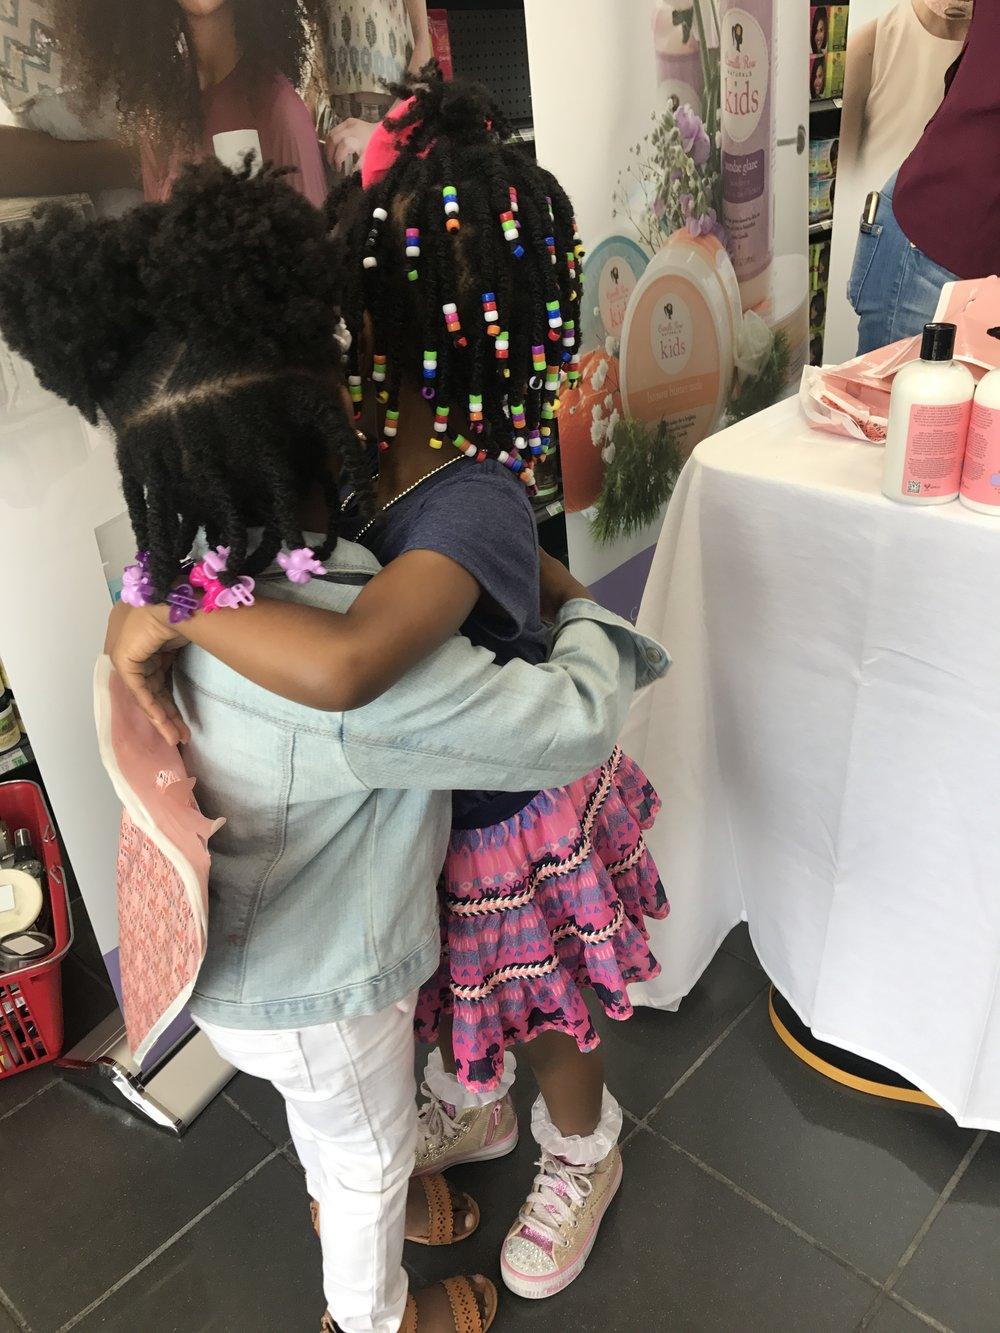 Camille_Rose_Naturals_Dayna_Bolden_Mothers_day_tour_2017_33.jpg